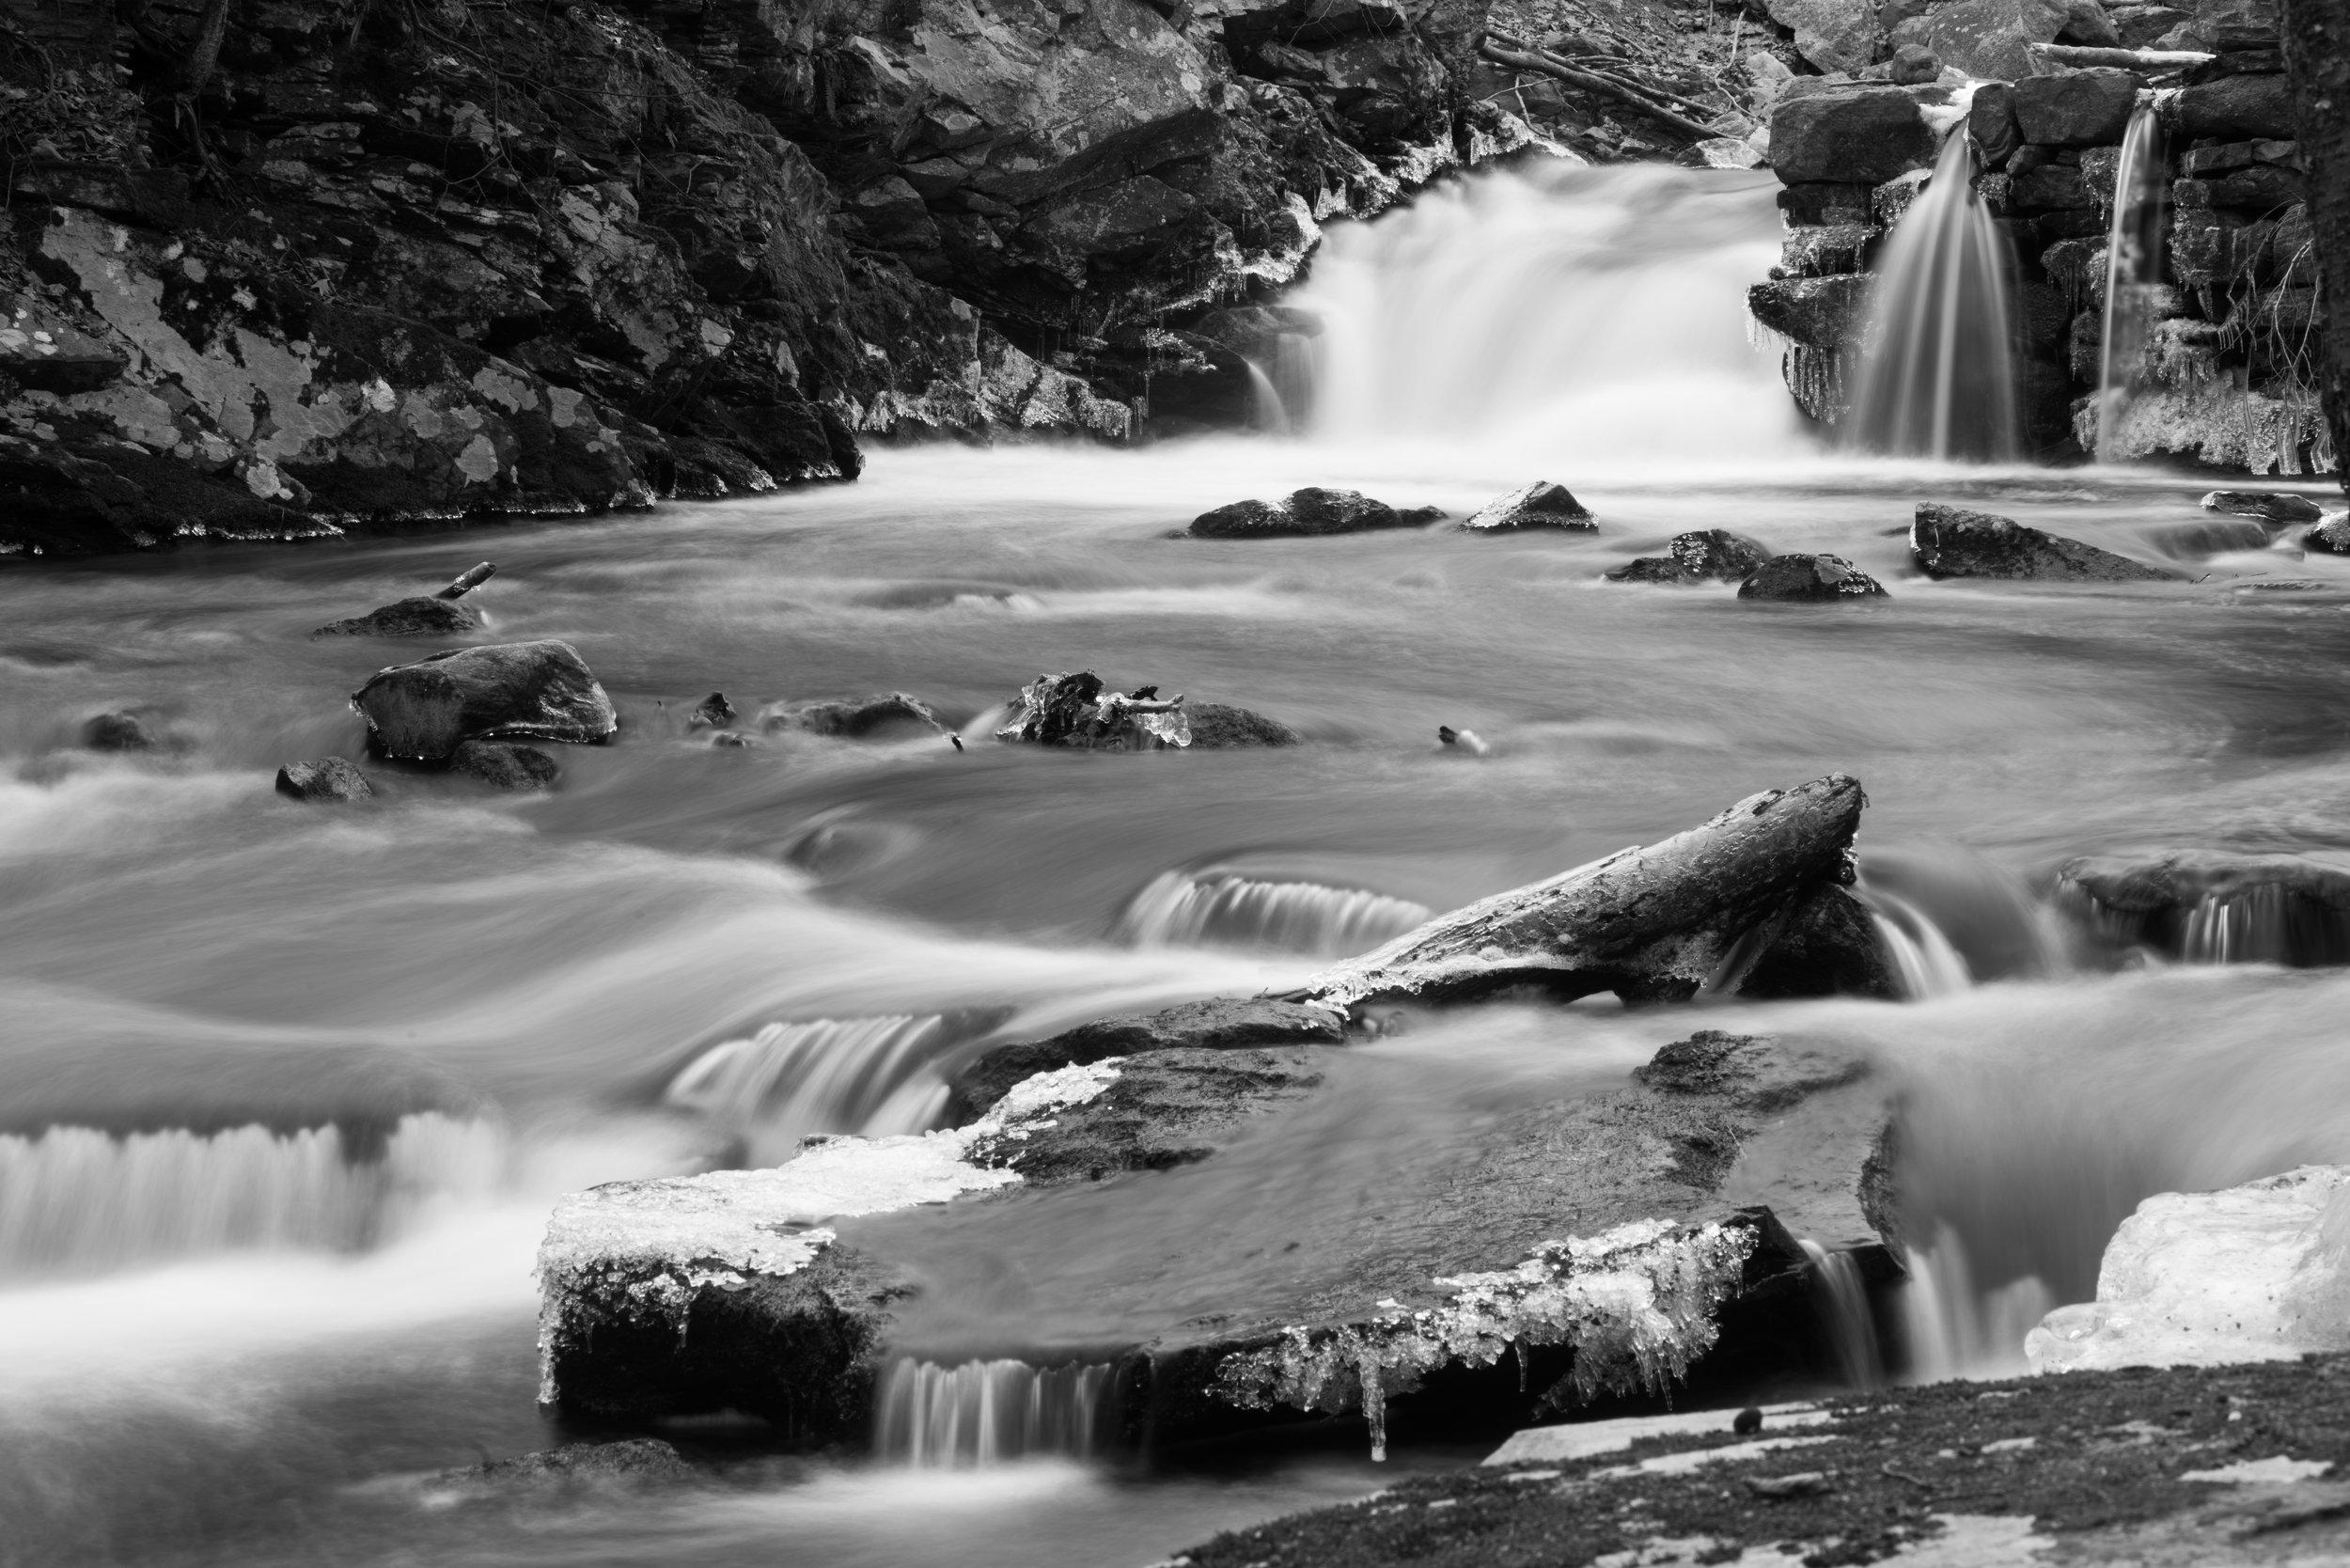 aspetuck waterfall 2_12_18.jpg